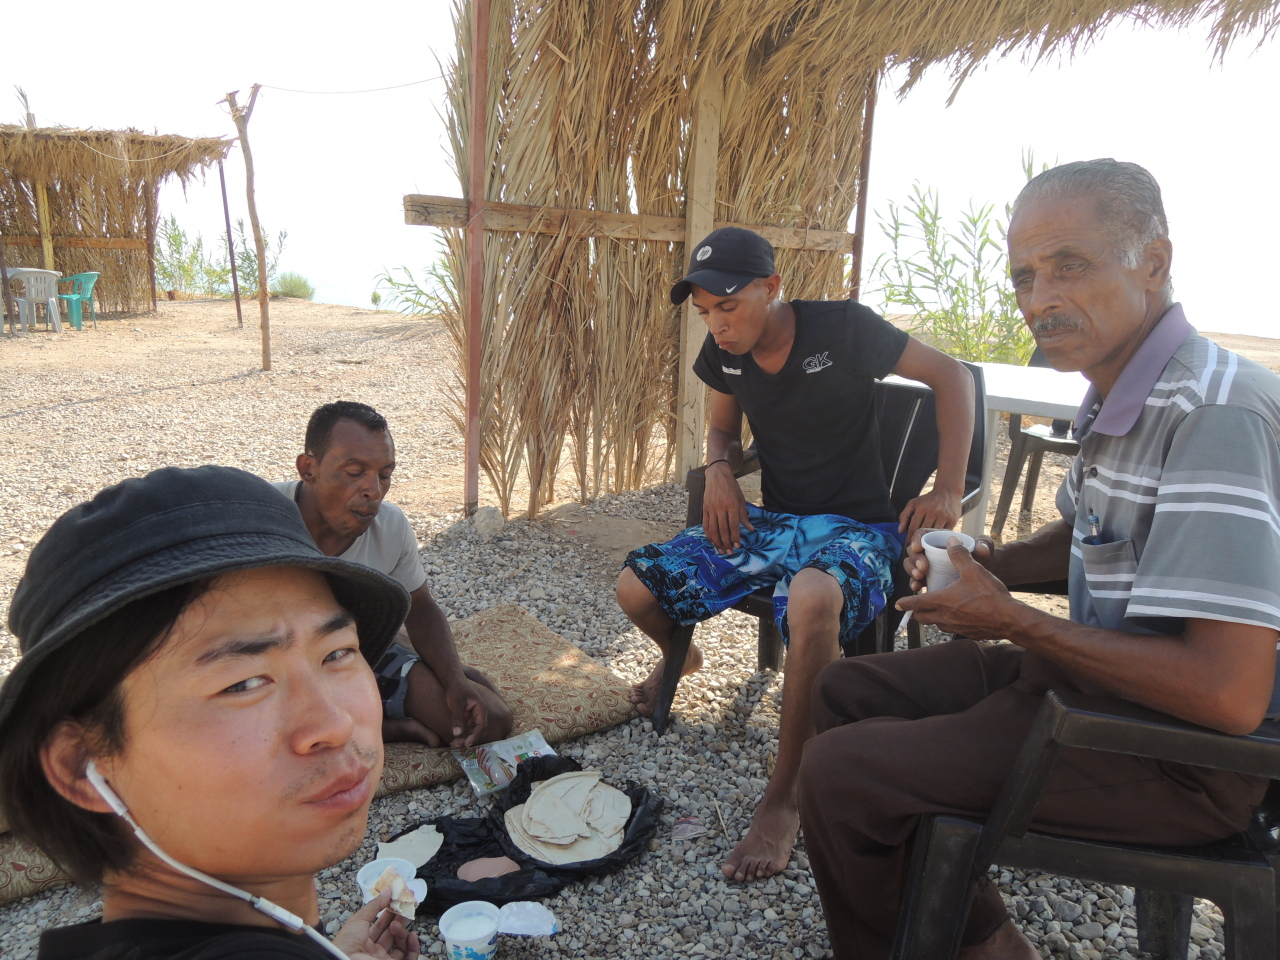 Jung Yun-ho (left) with street vendors of Jordan (Photo credit: Jung Yun-ho)